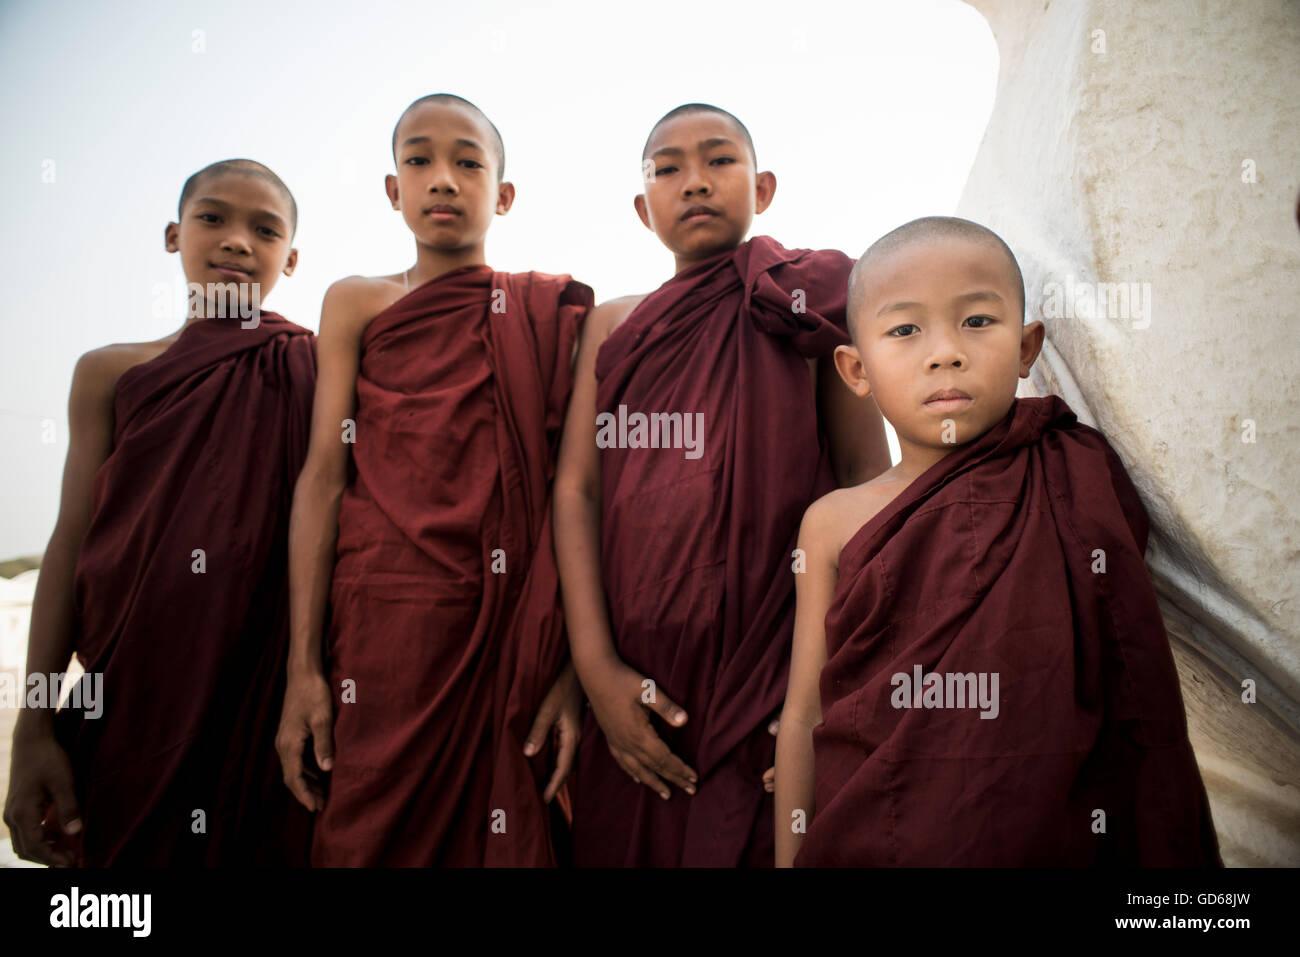 Un gruppo di monaci buddisti alla Pagoda Hsinbyume, Mingun, Sagaing, Myanmar. Immagini Stock